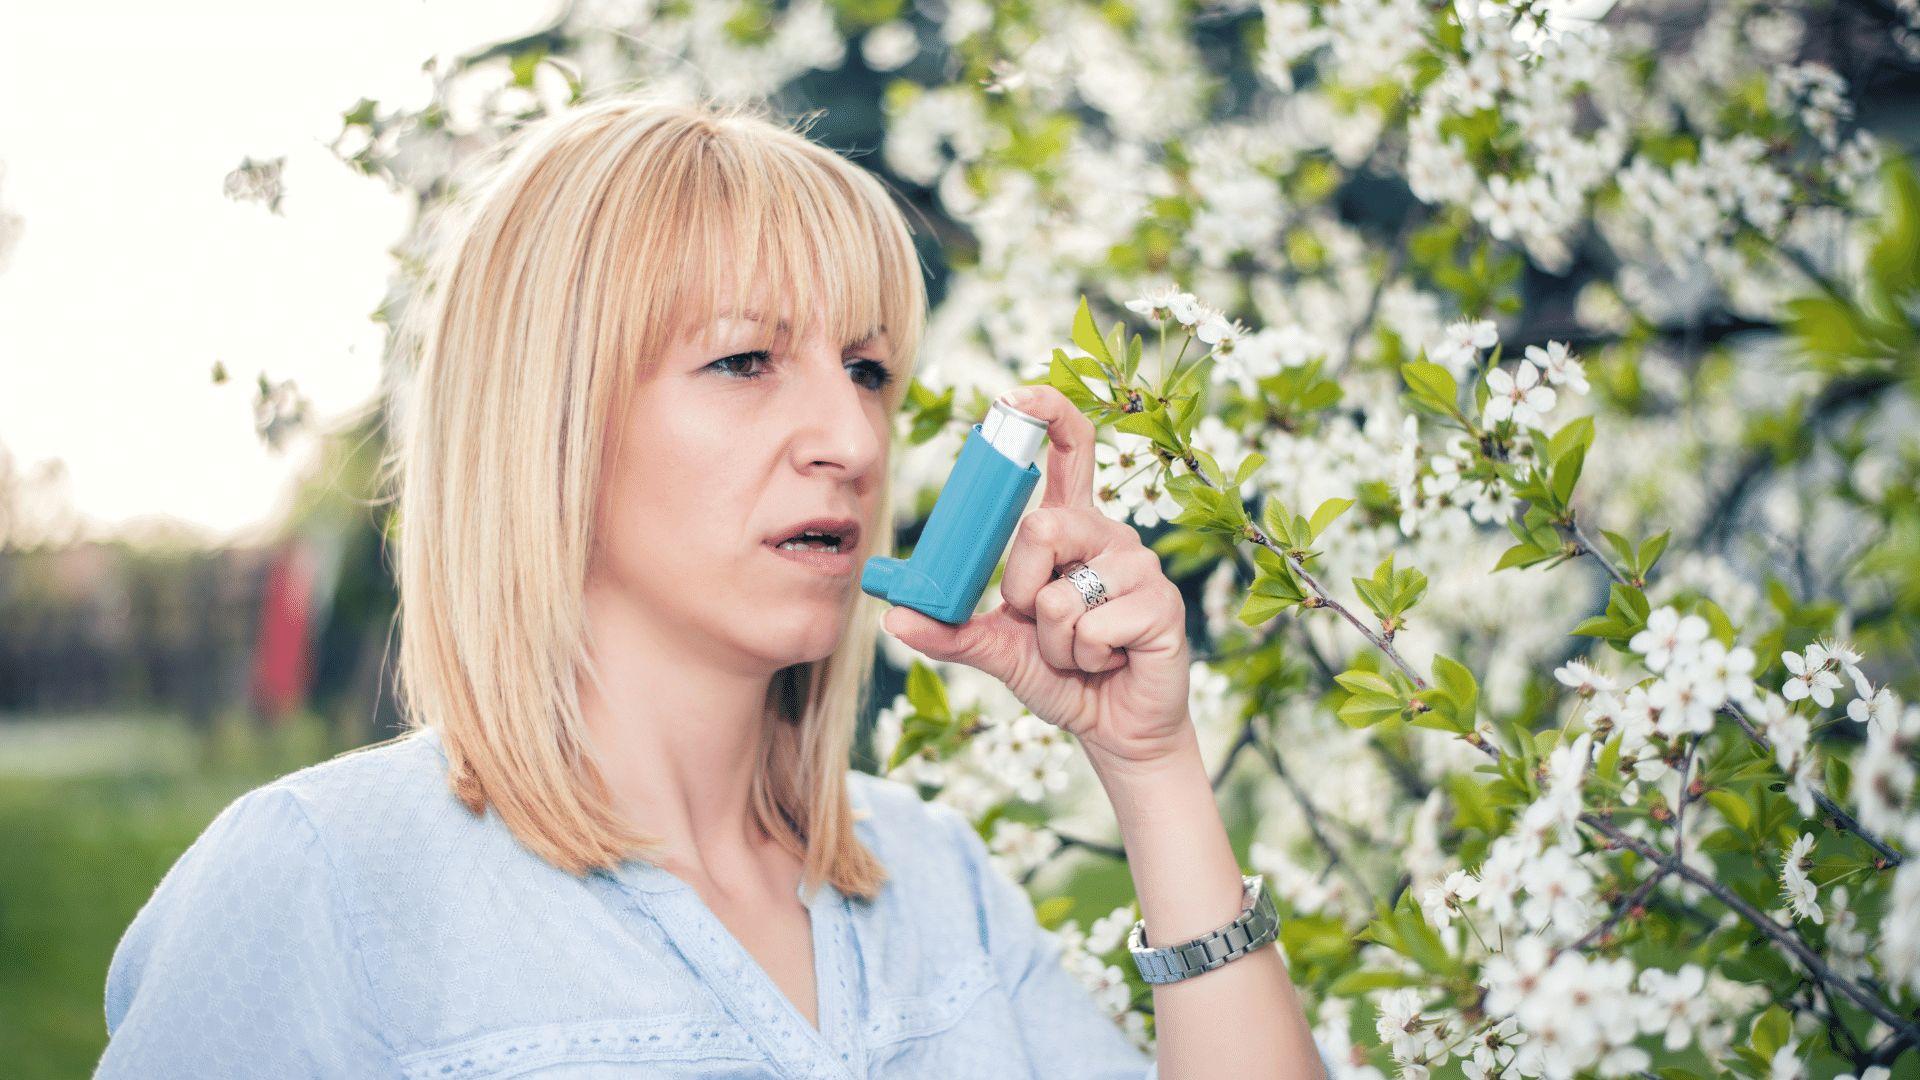 Spring thunderstorm season and COVID make preparations for asthma season vital